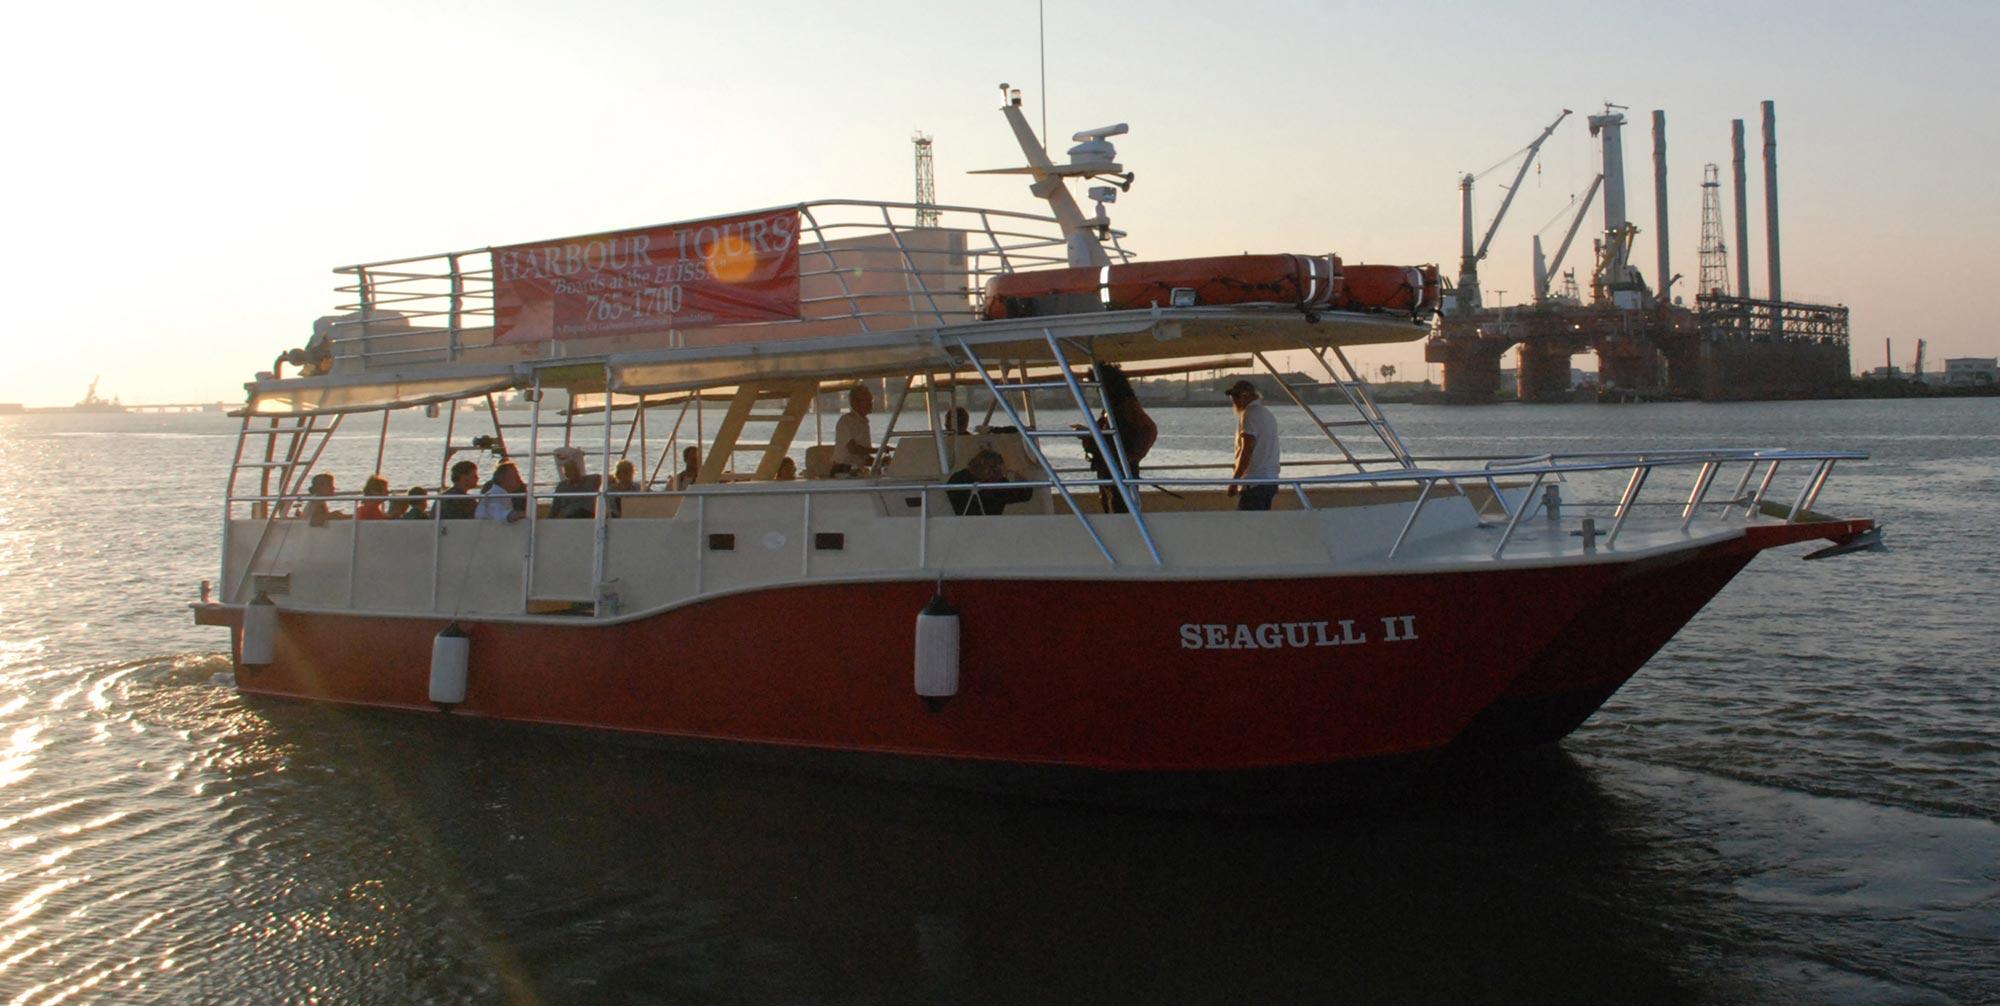 Seagull II Harbor Tour Amp Dolphin Watch Galveston